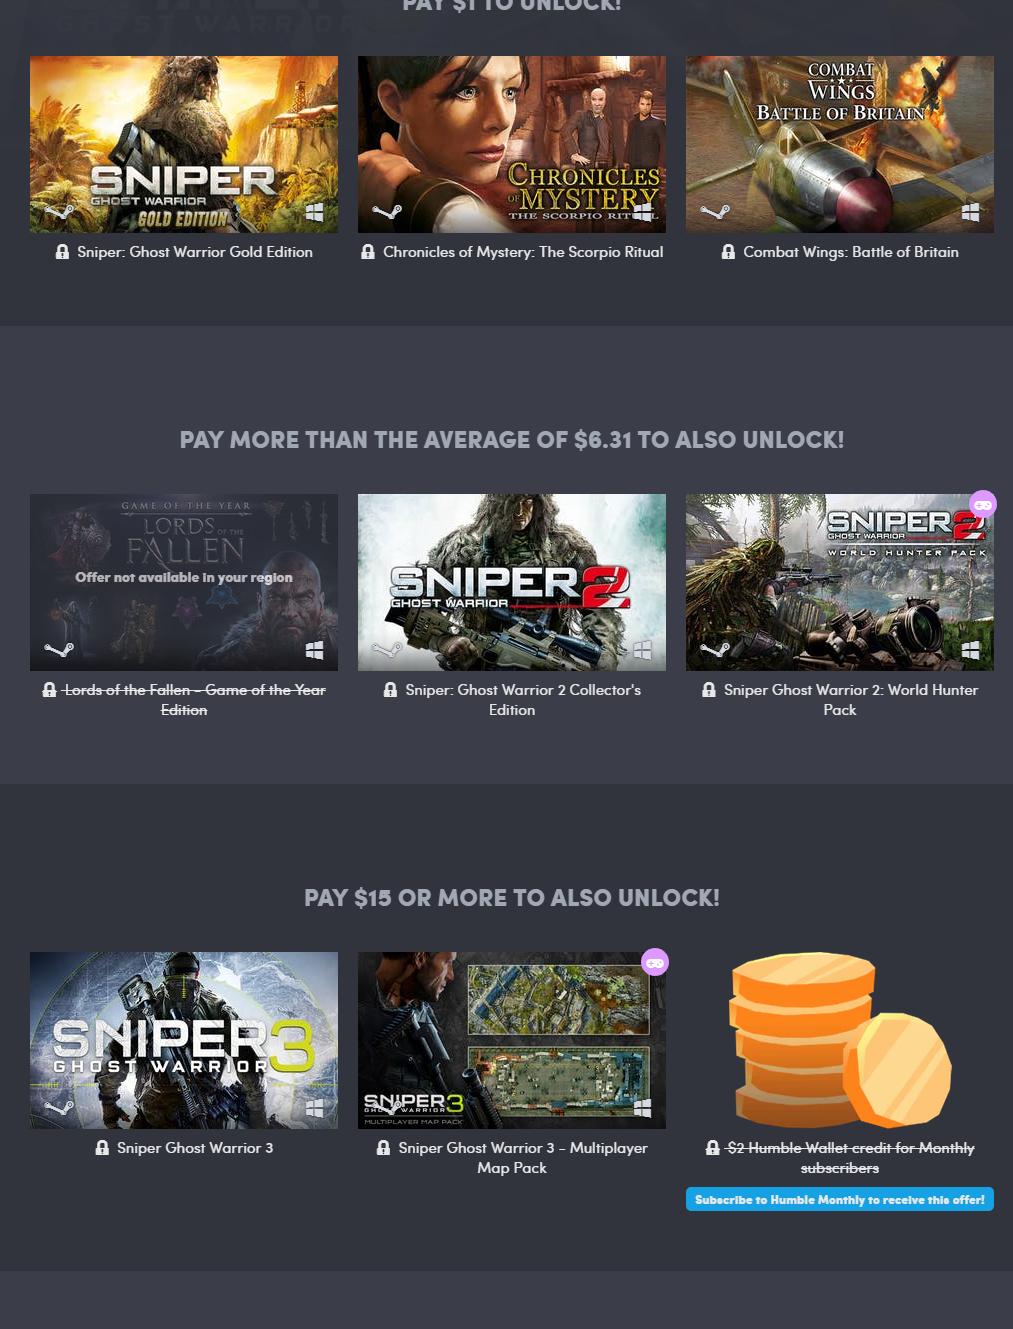 screencapture-humblebundle-games-cigames-bundle-2018-07-18-03_04_48.png